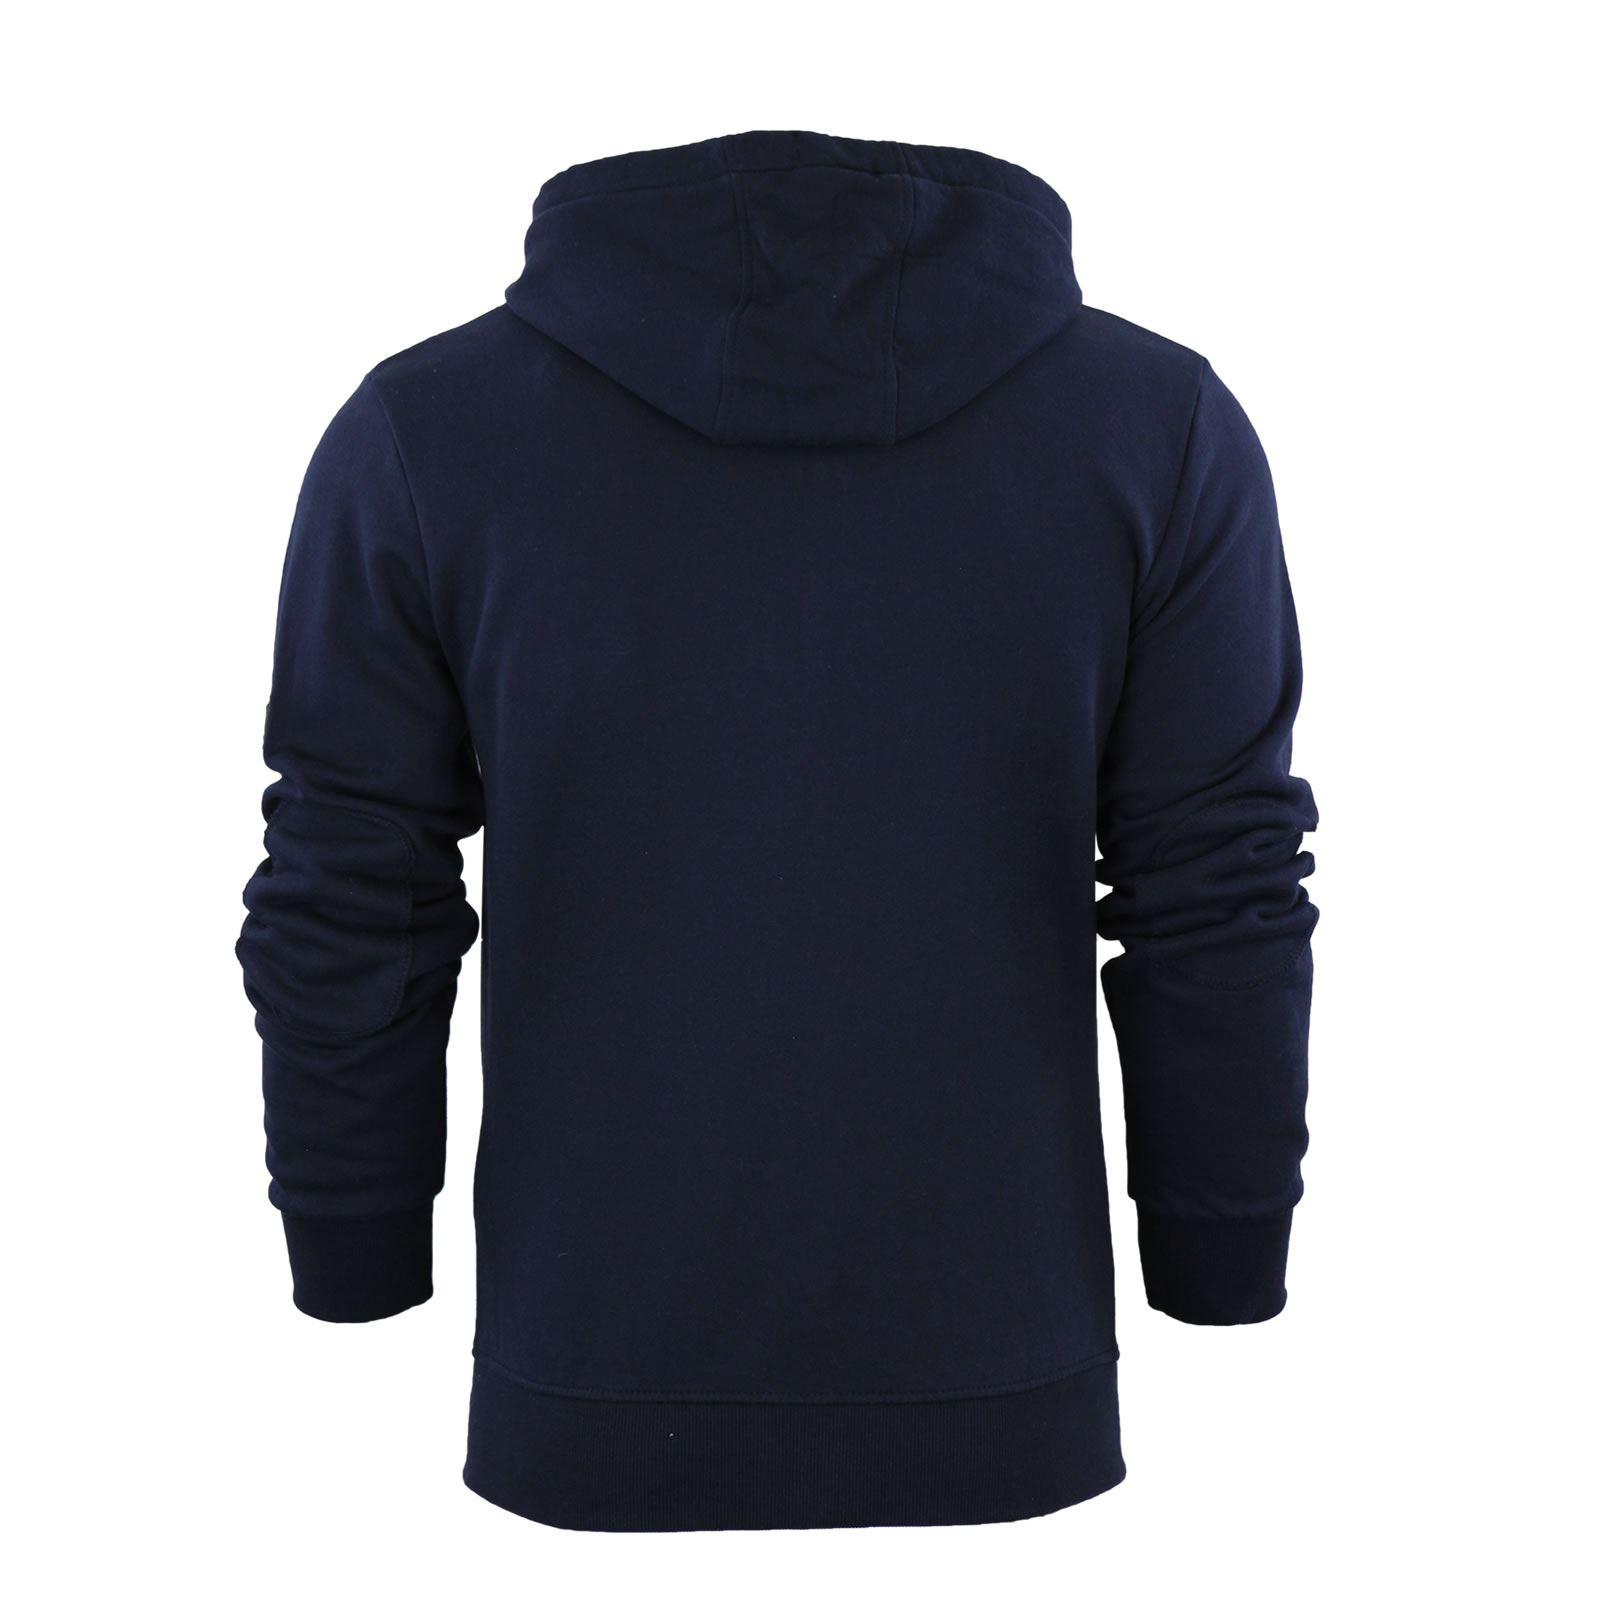 Mens-Hoodie-Smith-amp-Jones-Zip-Up-Hooded-Sweater-Jumper thumbnail 18